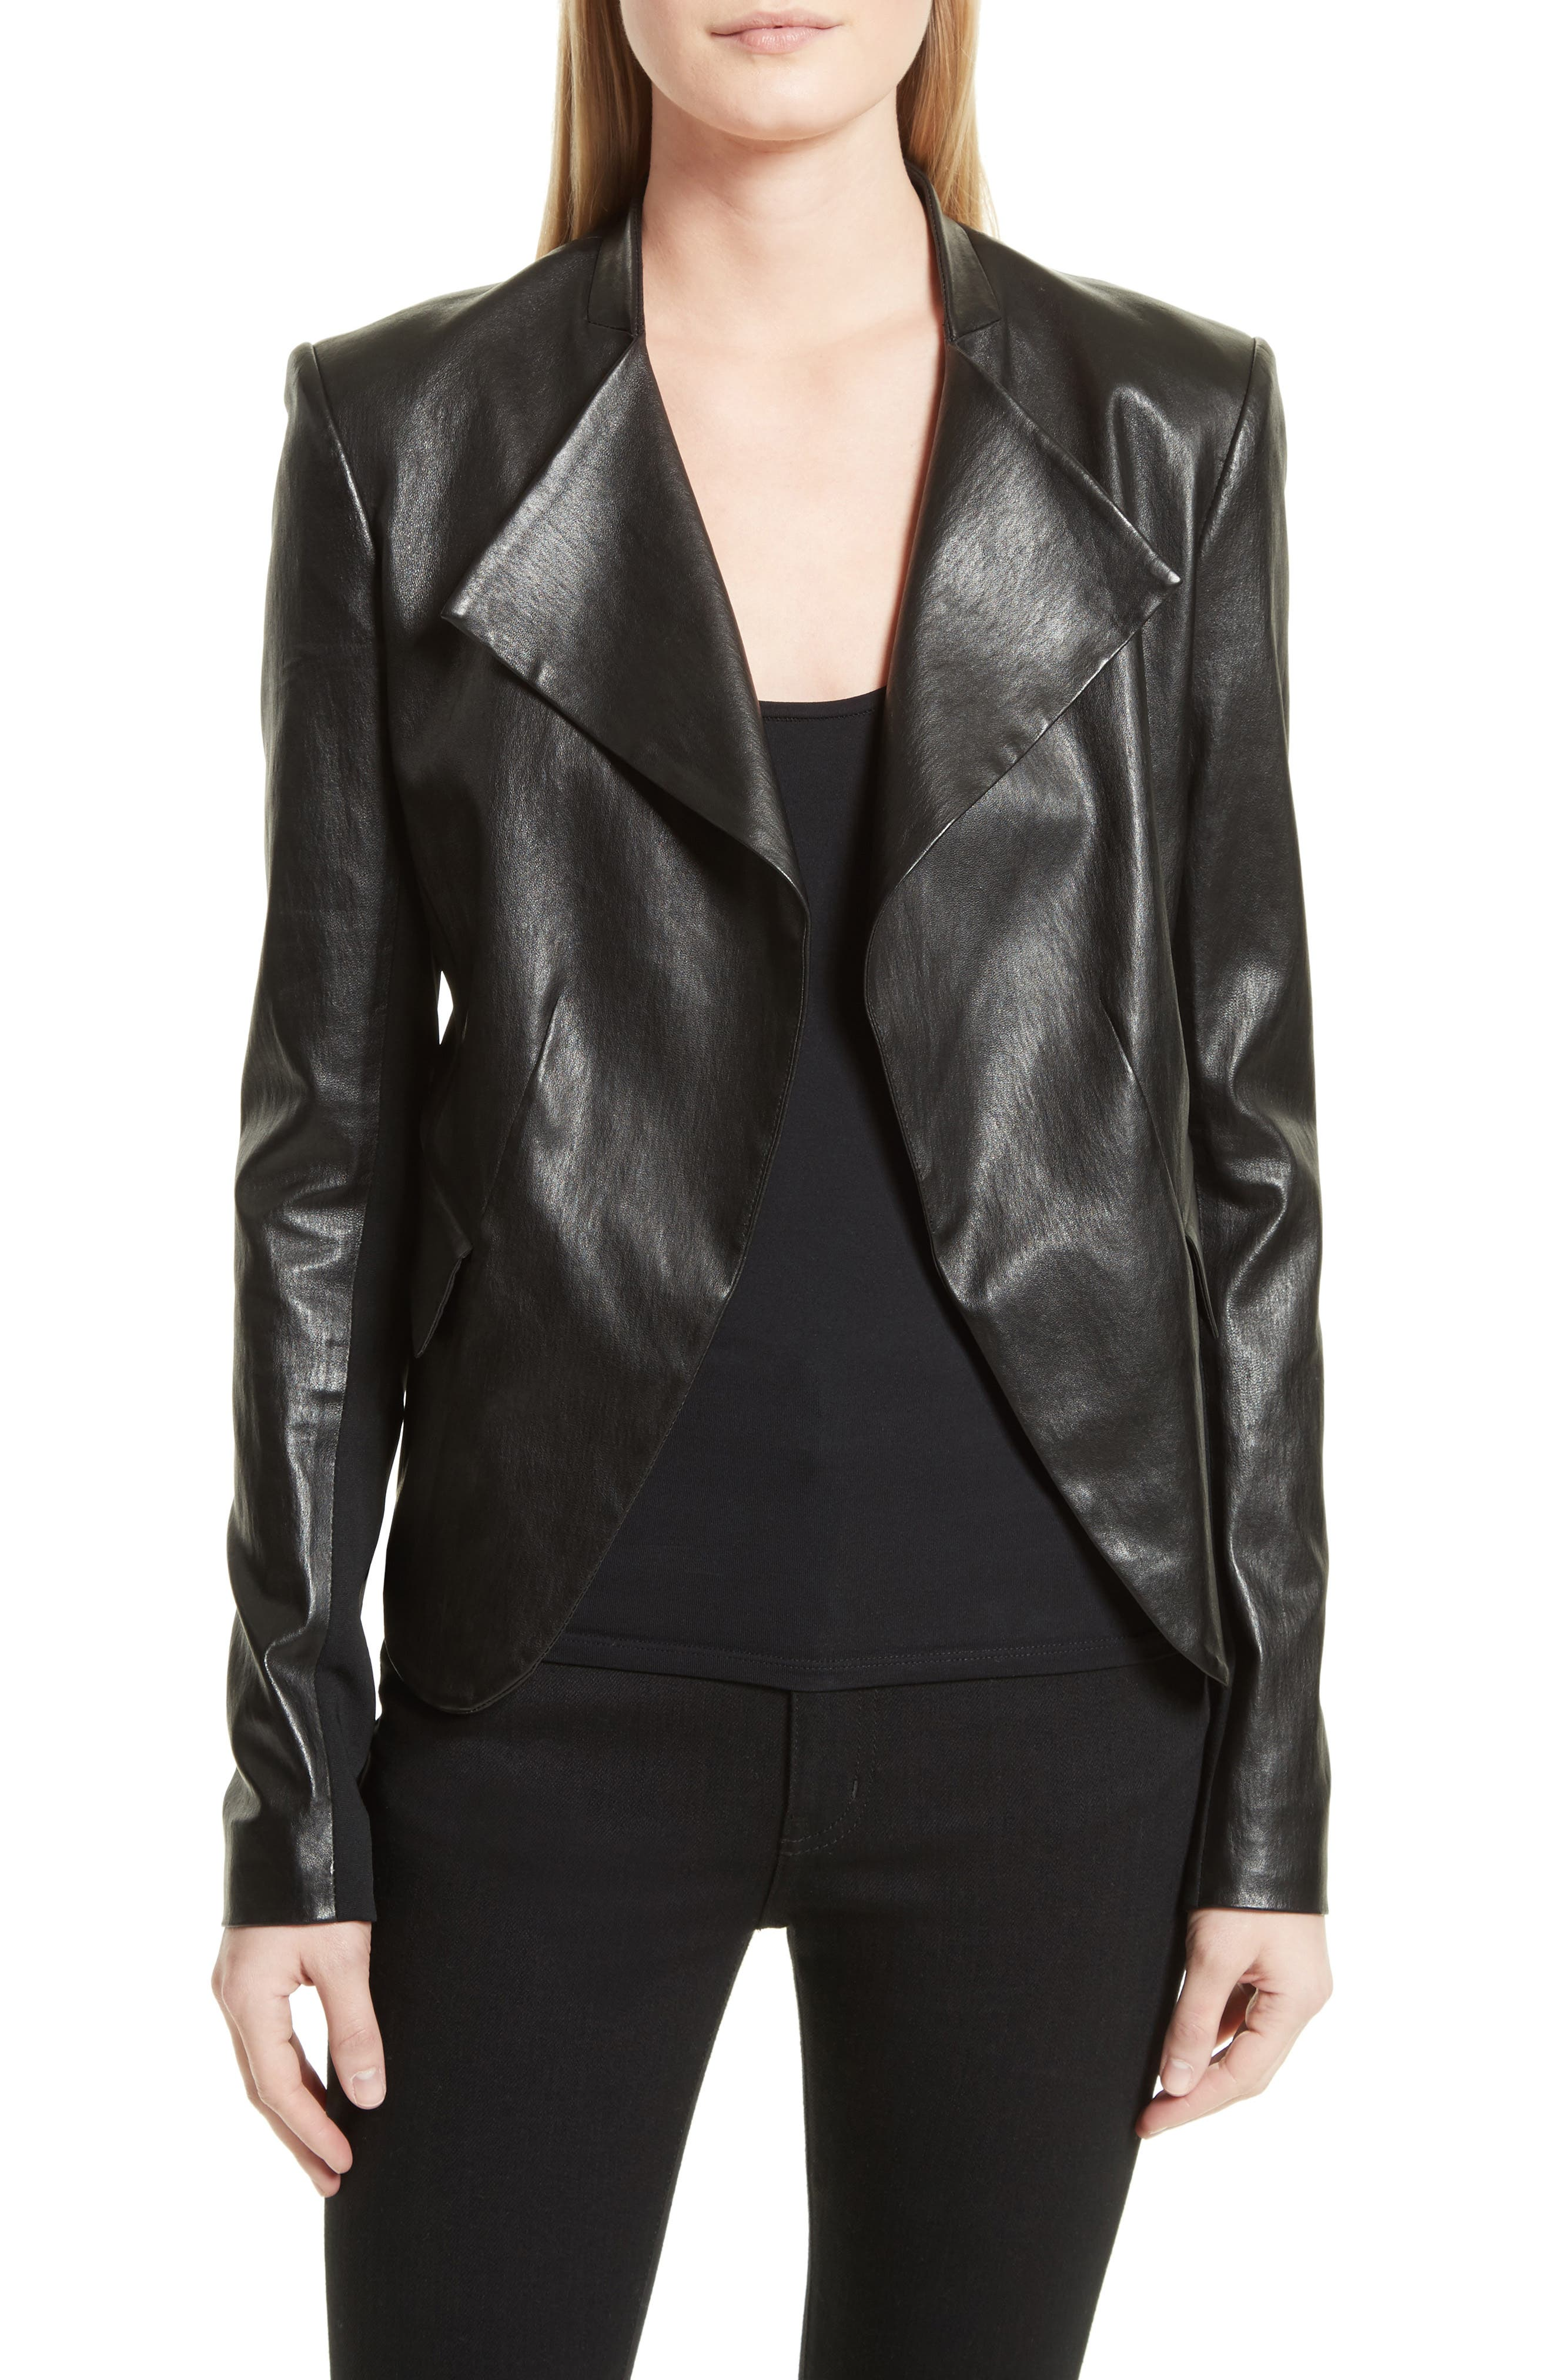 Bristol Peplum Leather Jacket,                             Main thumbnail 1, color,                             001